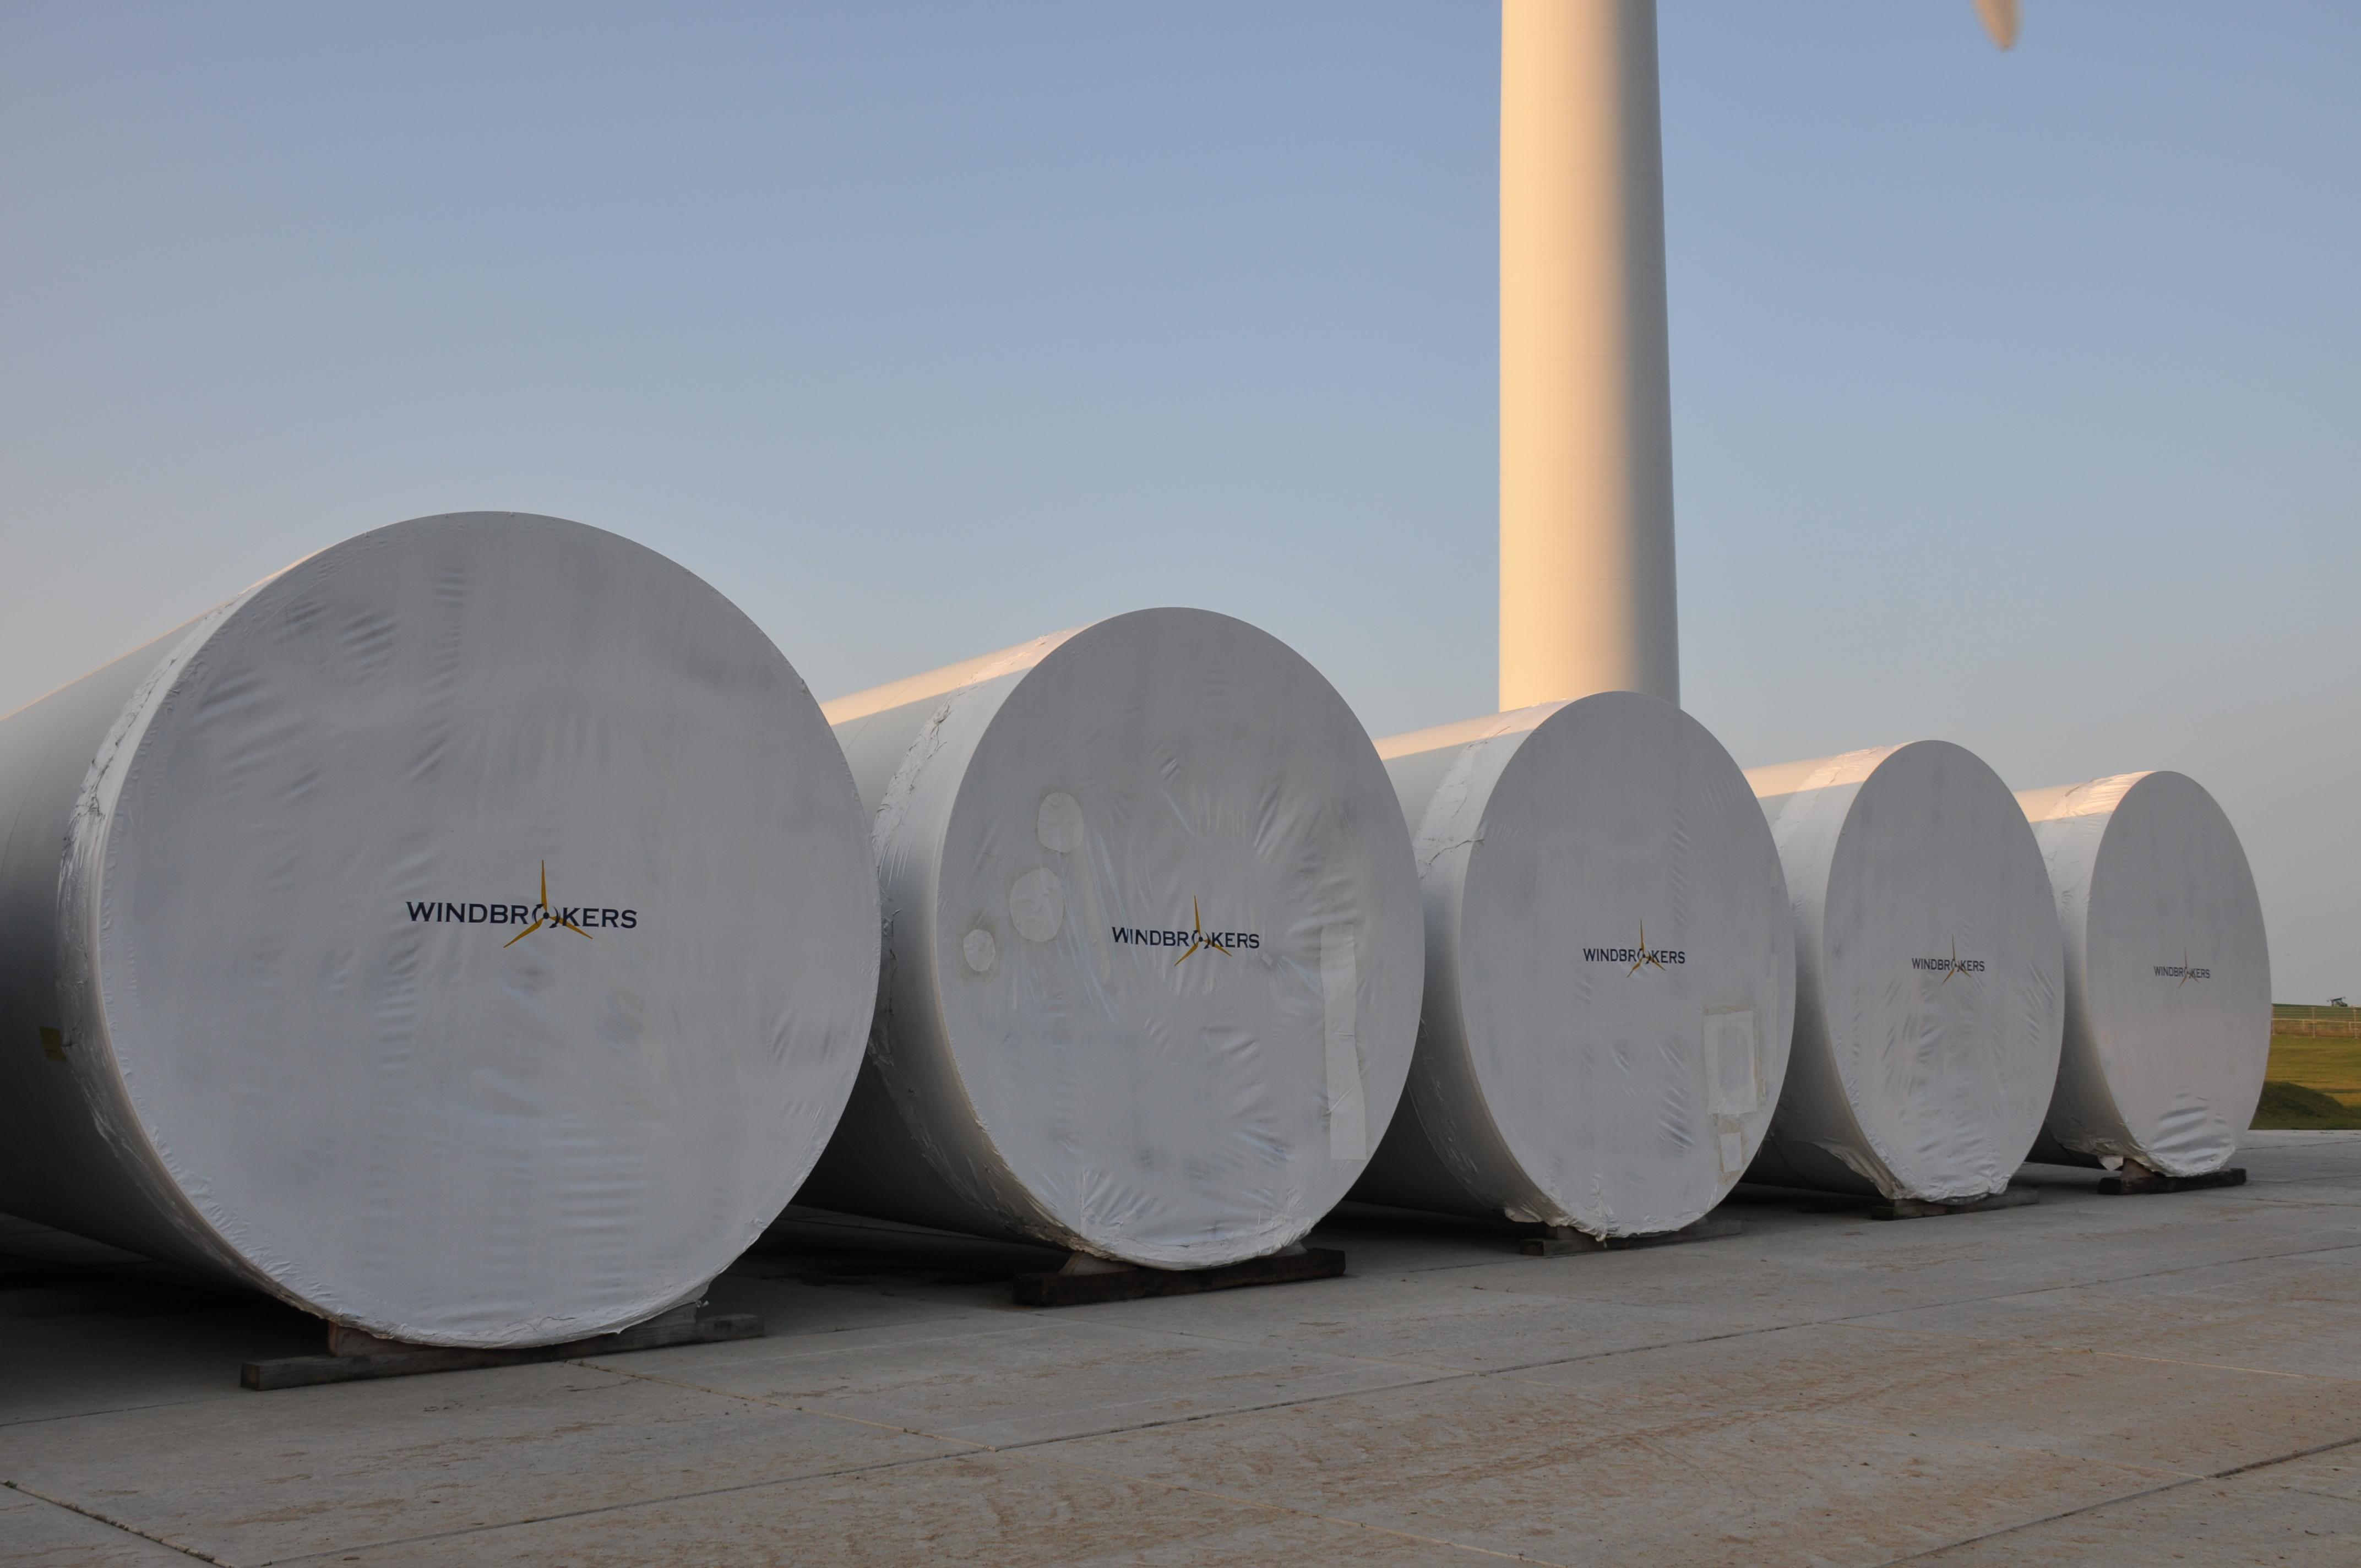 Windcentrale Harlingen en Windbrokers